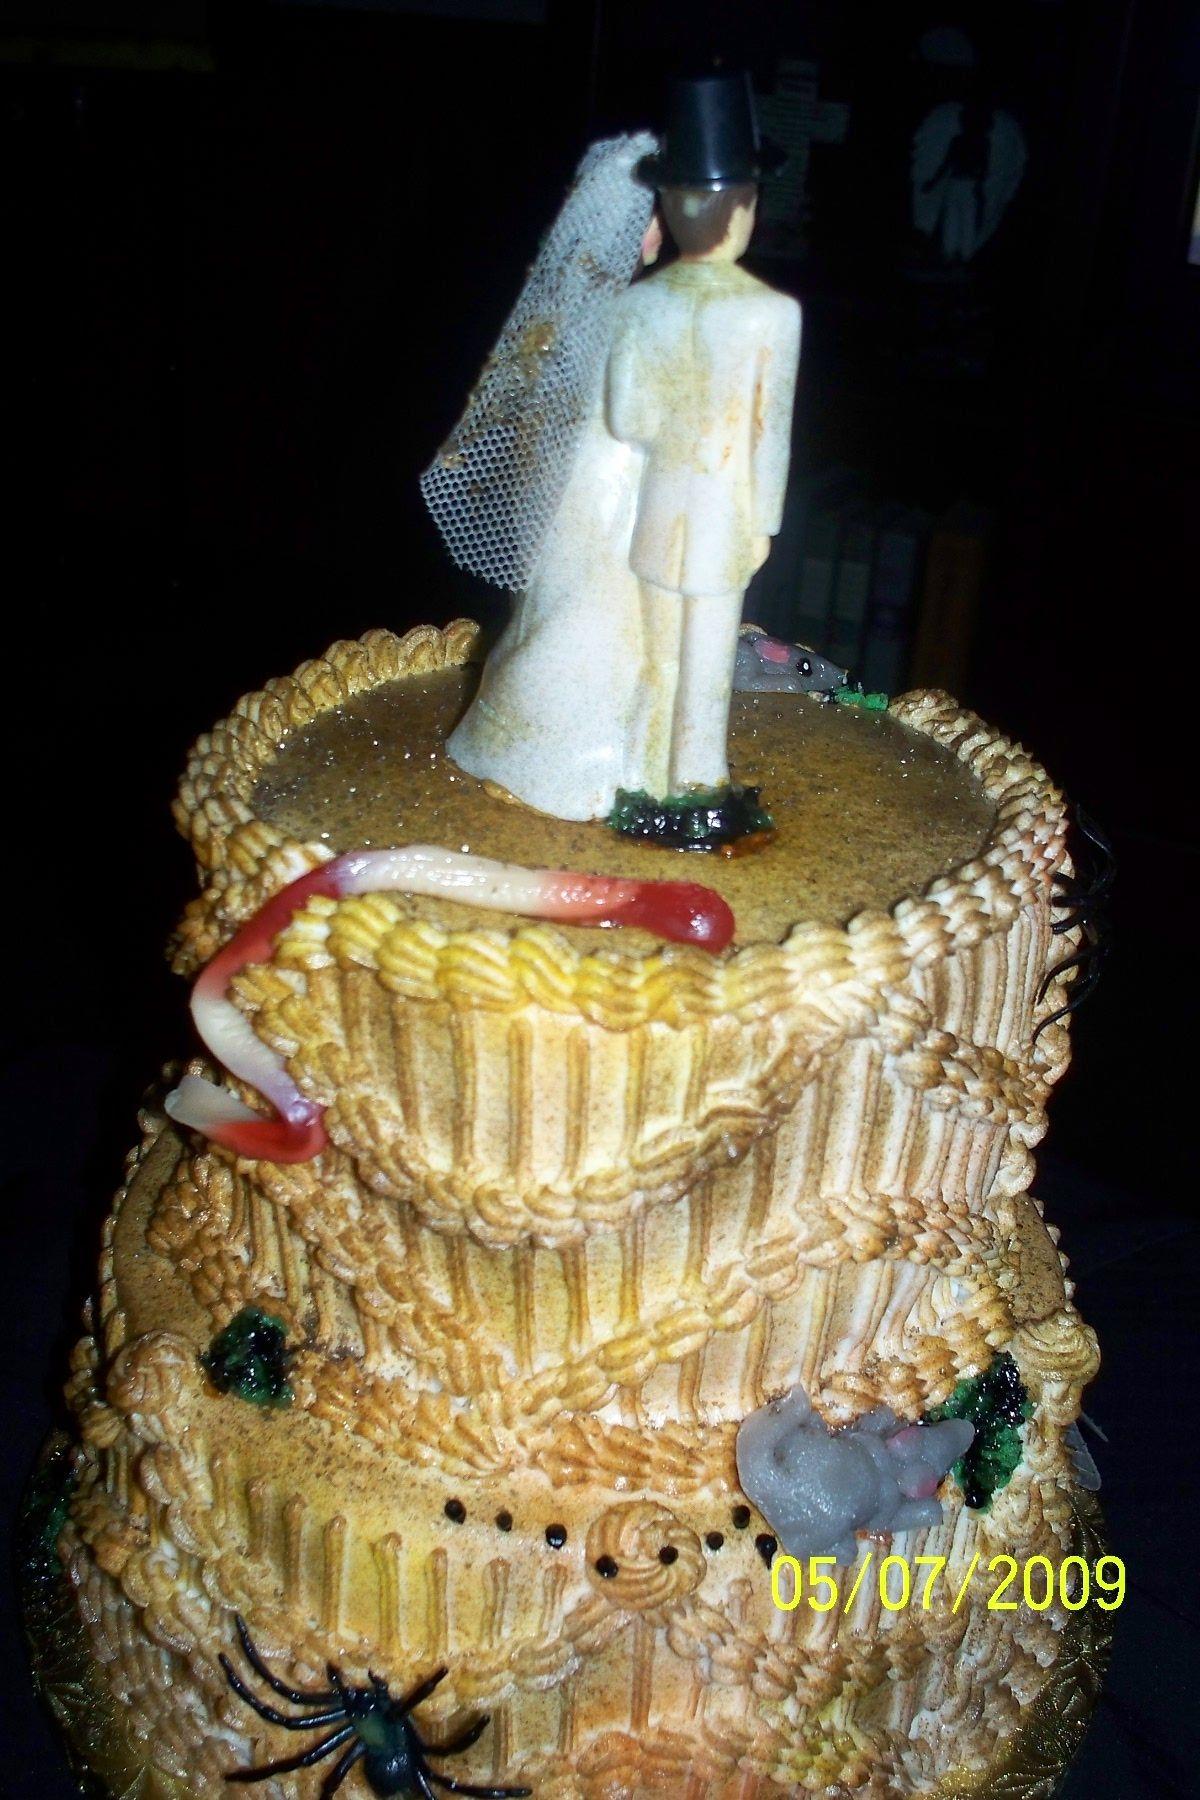 Miss Havisham\'s Rotten Wedding Cake from the novel \